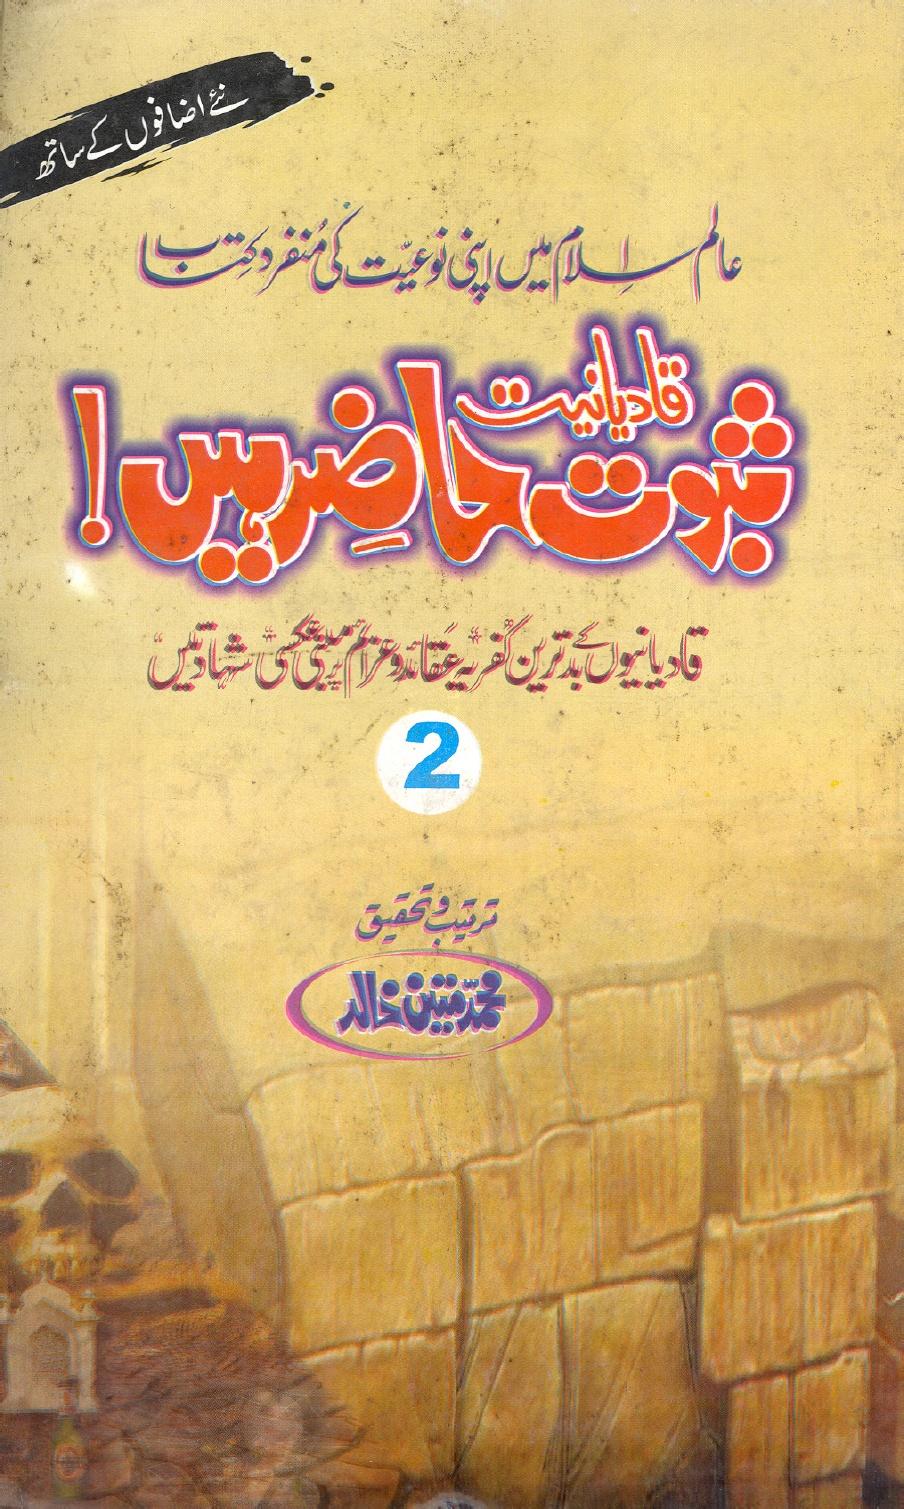 Qadianiat Saboot Hazir Hain J 2